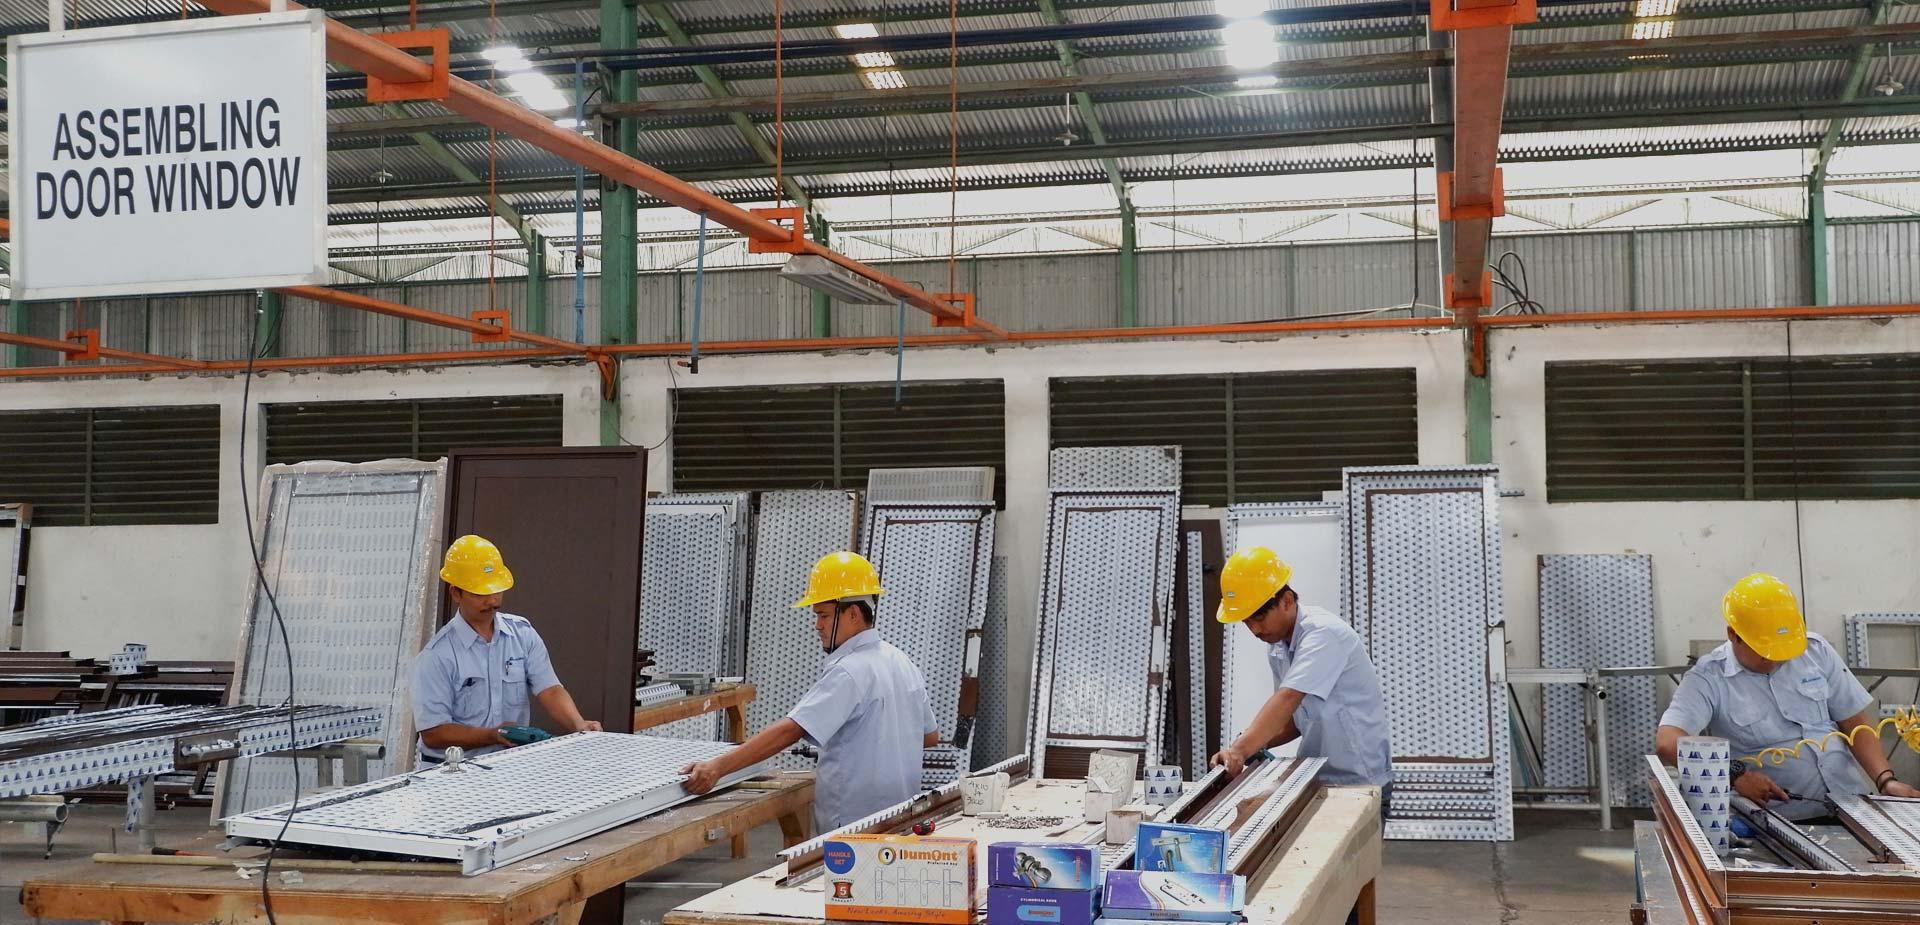 alcomex-indo-aluminium-laquer-furniture-extrusion-finished-goods-homeslide-8